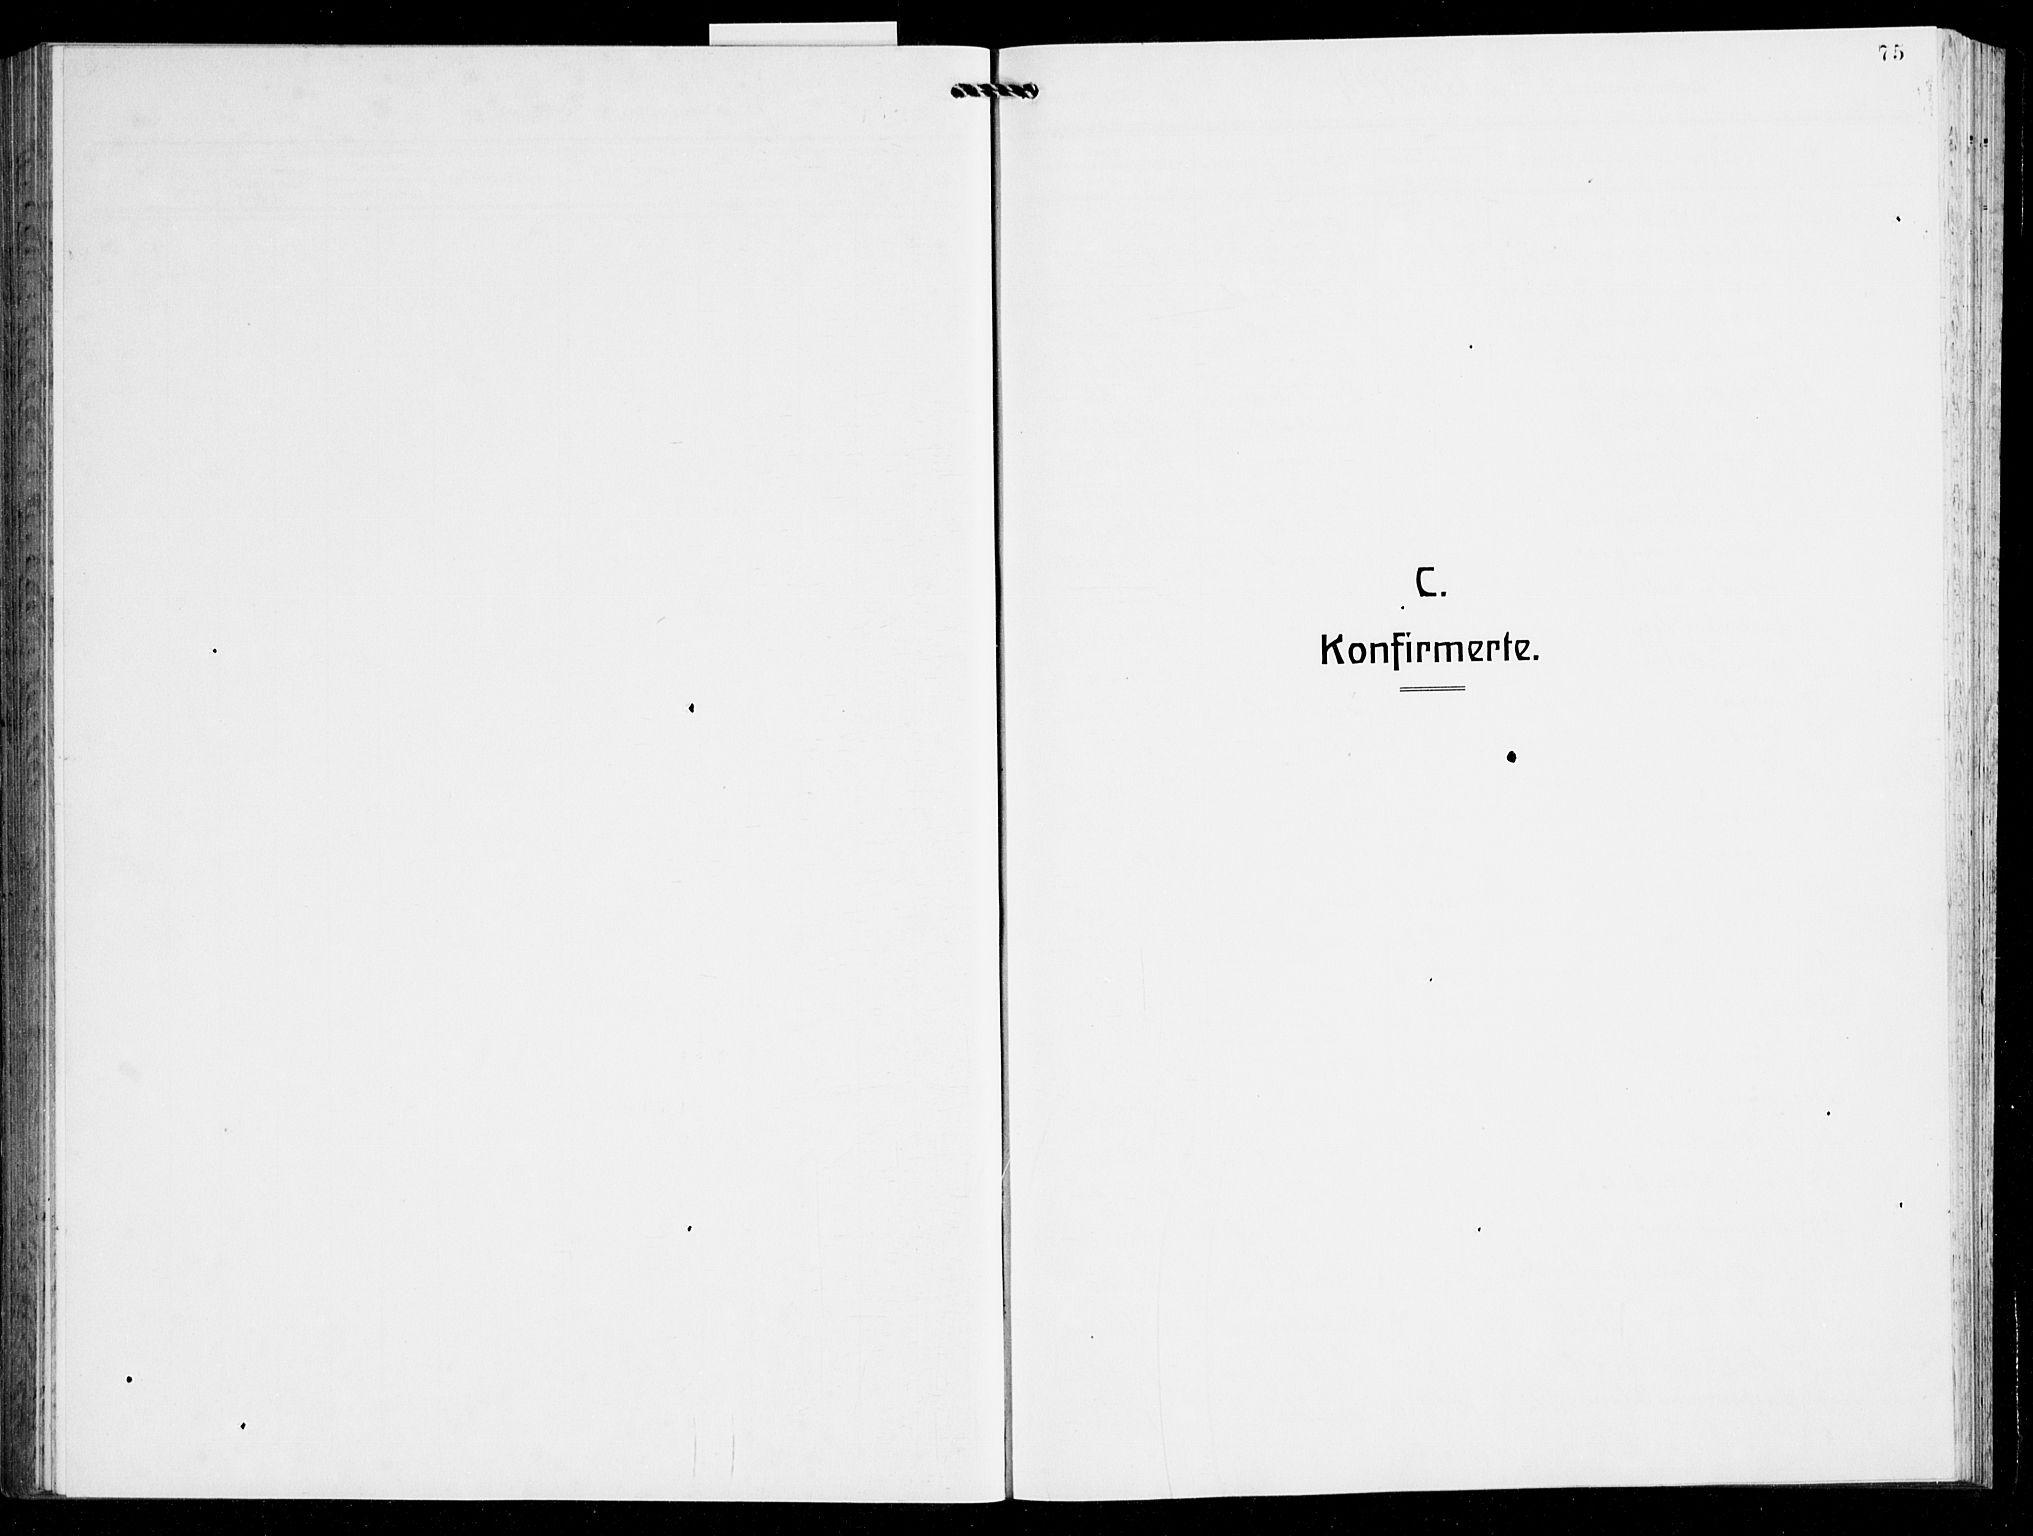 SAB, Finnås sokneprestembete, H/Ha/Hab/Haba/L0005: Klokkerbok nr. A 5, 1924-1945, s. 75